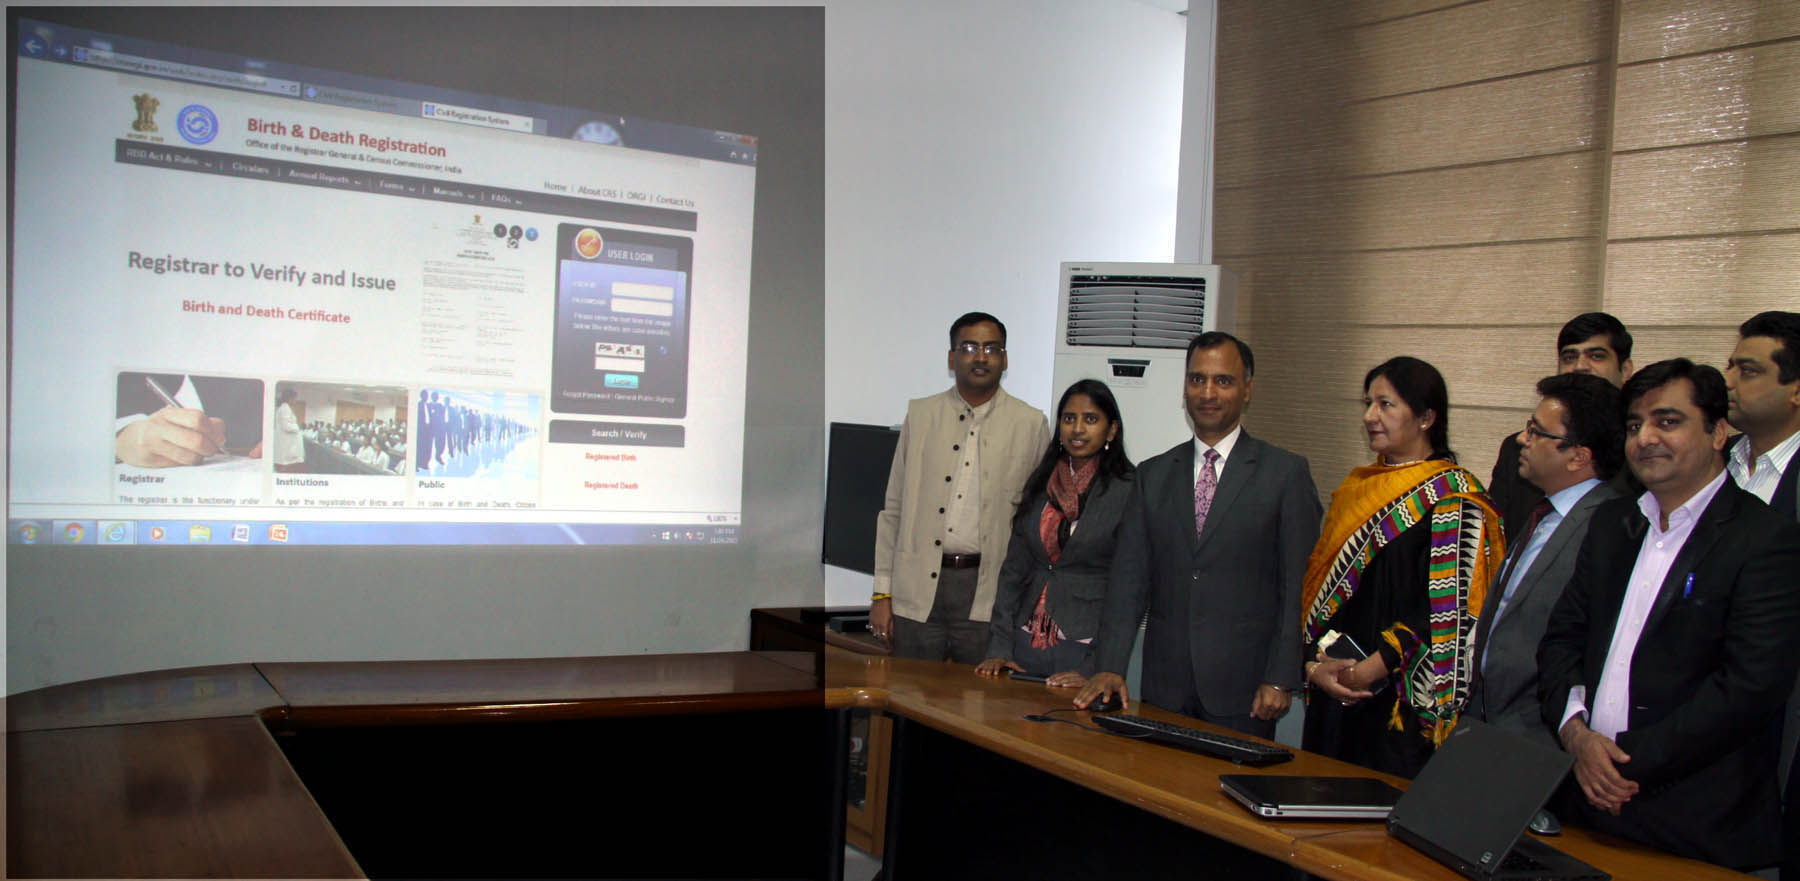 The Adviser to the Administrator, UT, Chandigarh, Mr. Vijay Dev alongwith senior officers launching the online registration of Birth Certificate at UT Secretariat,  Chandigarh on Tuesday, November 24, 2015.